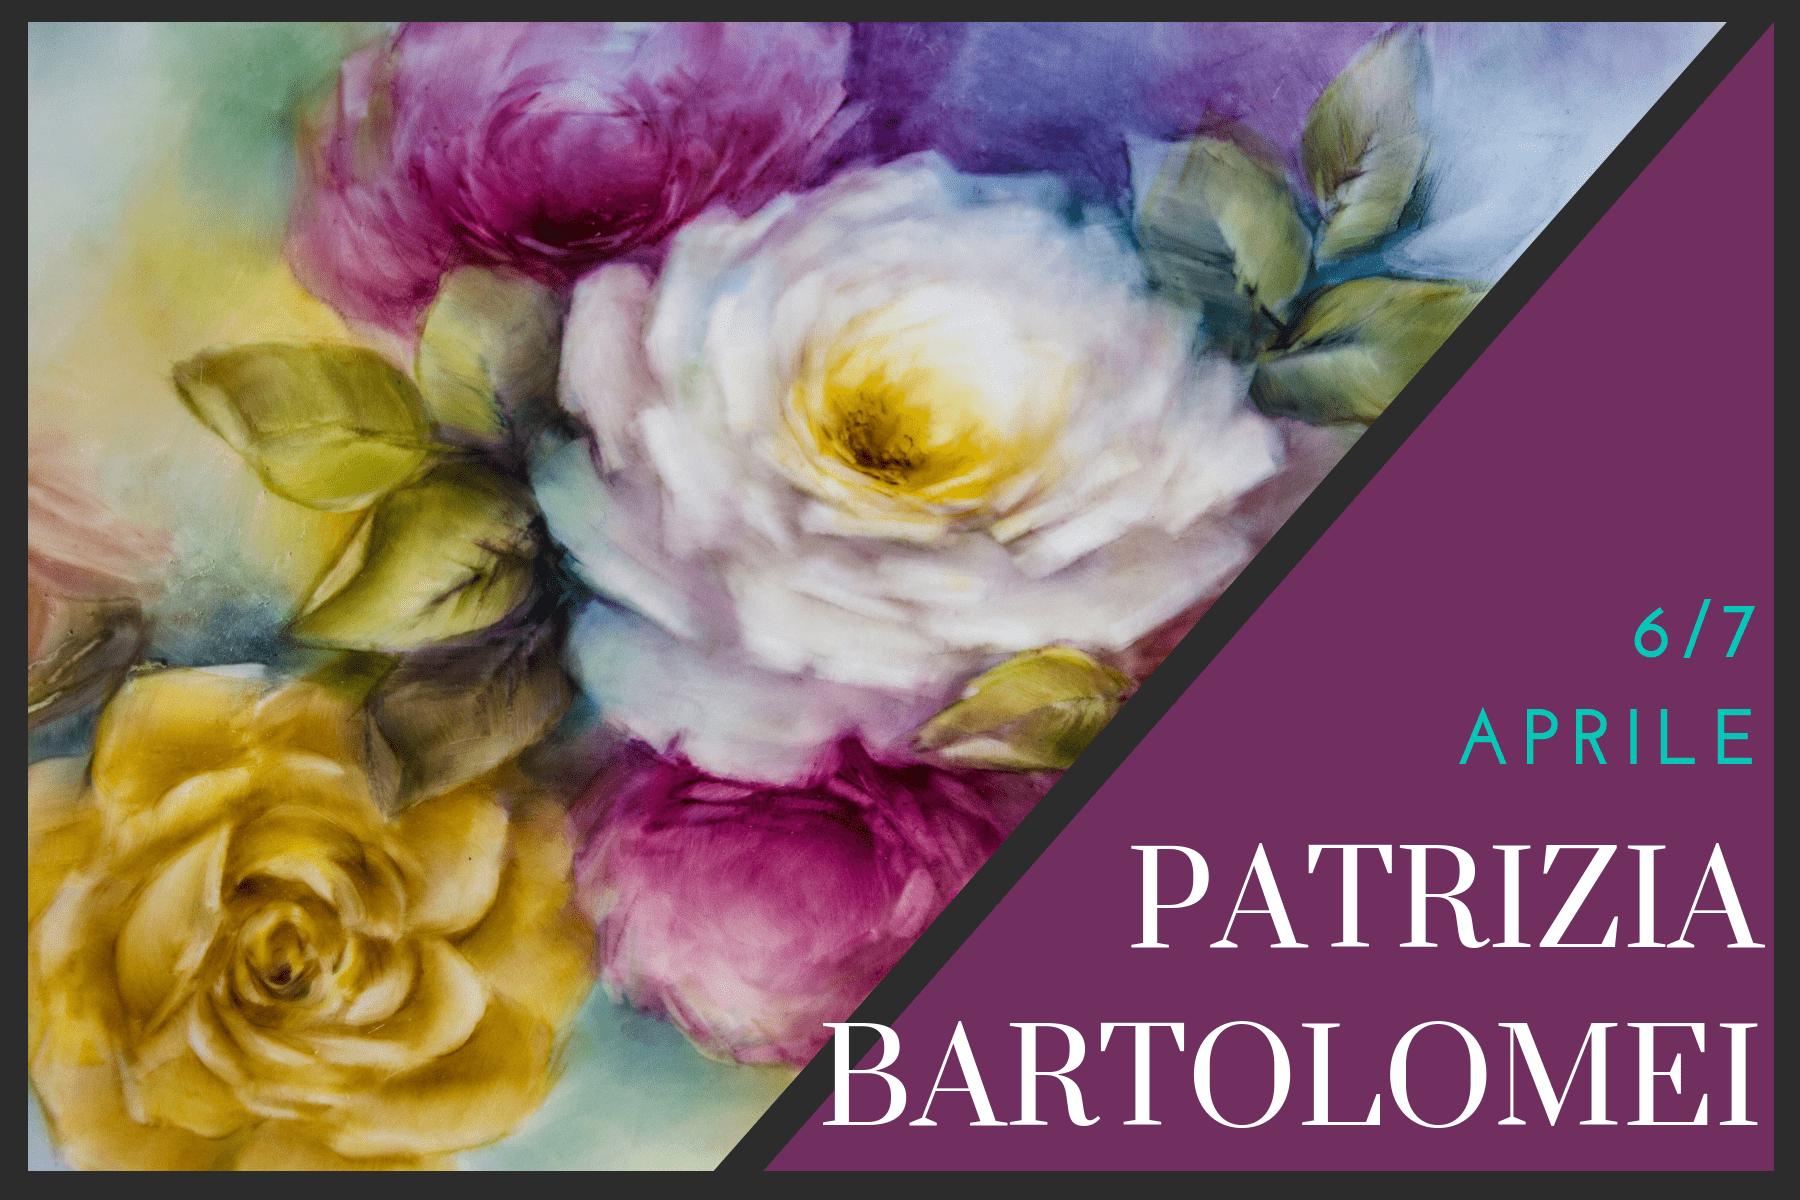 Patrizia Bartolomei